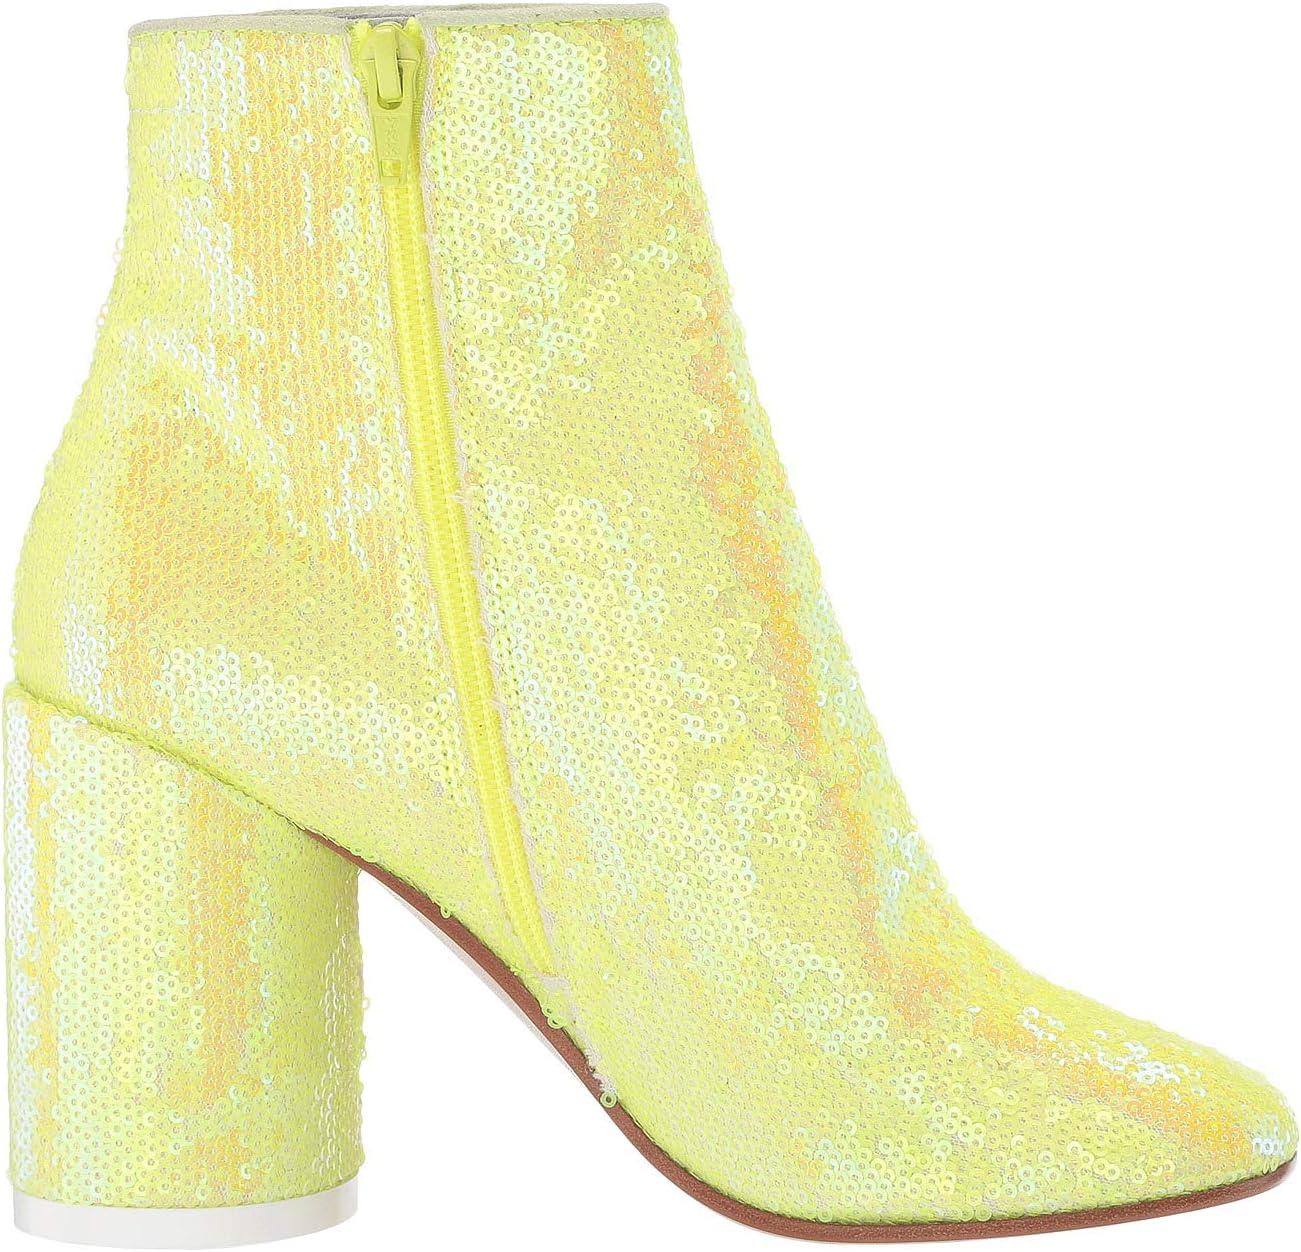 MM6 Maison Margiela Classic Round Heel Sequin Boot   Women's shoes   2020 Newest